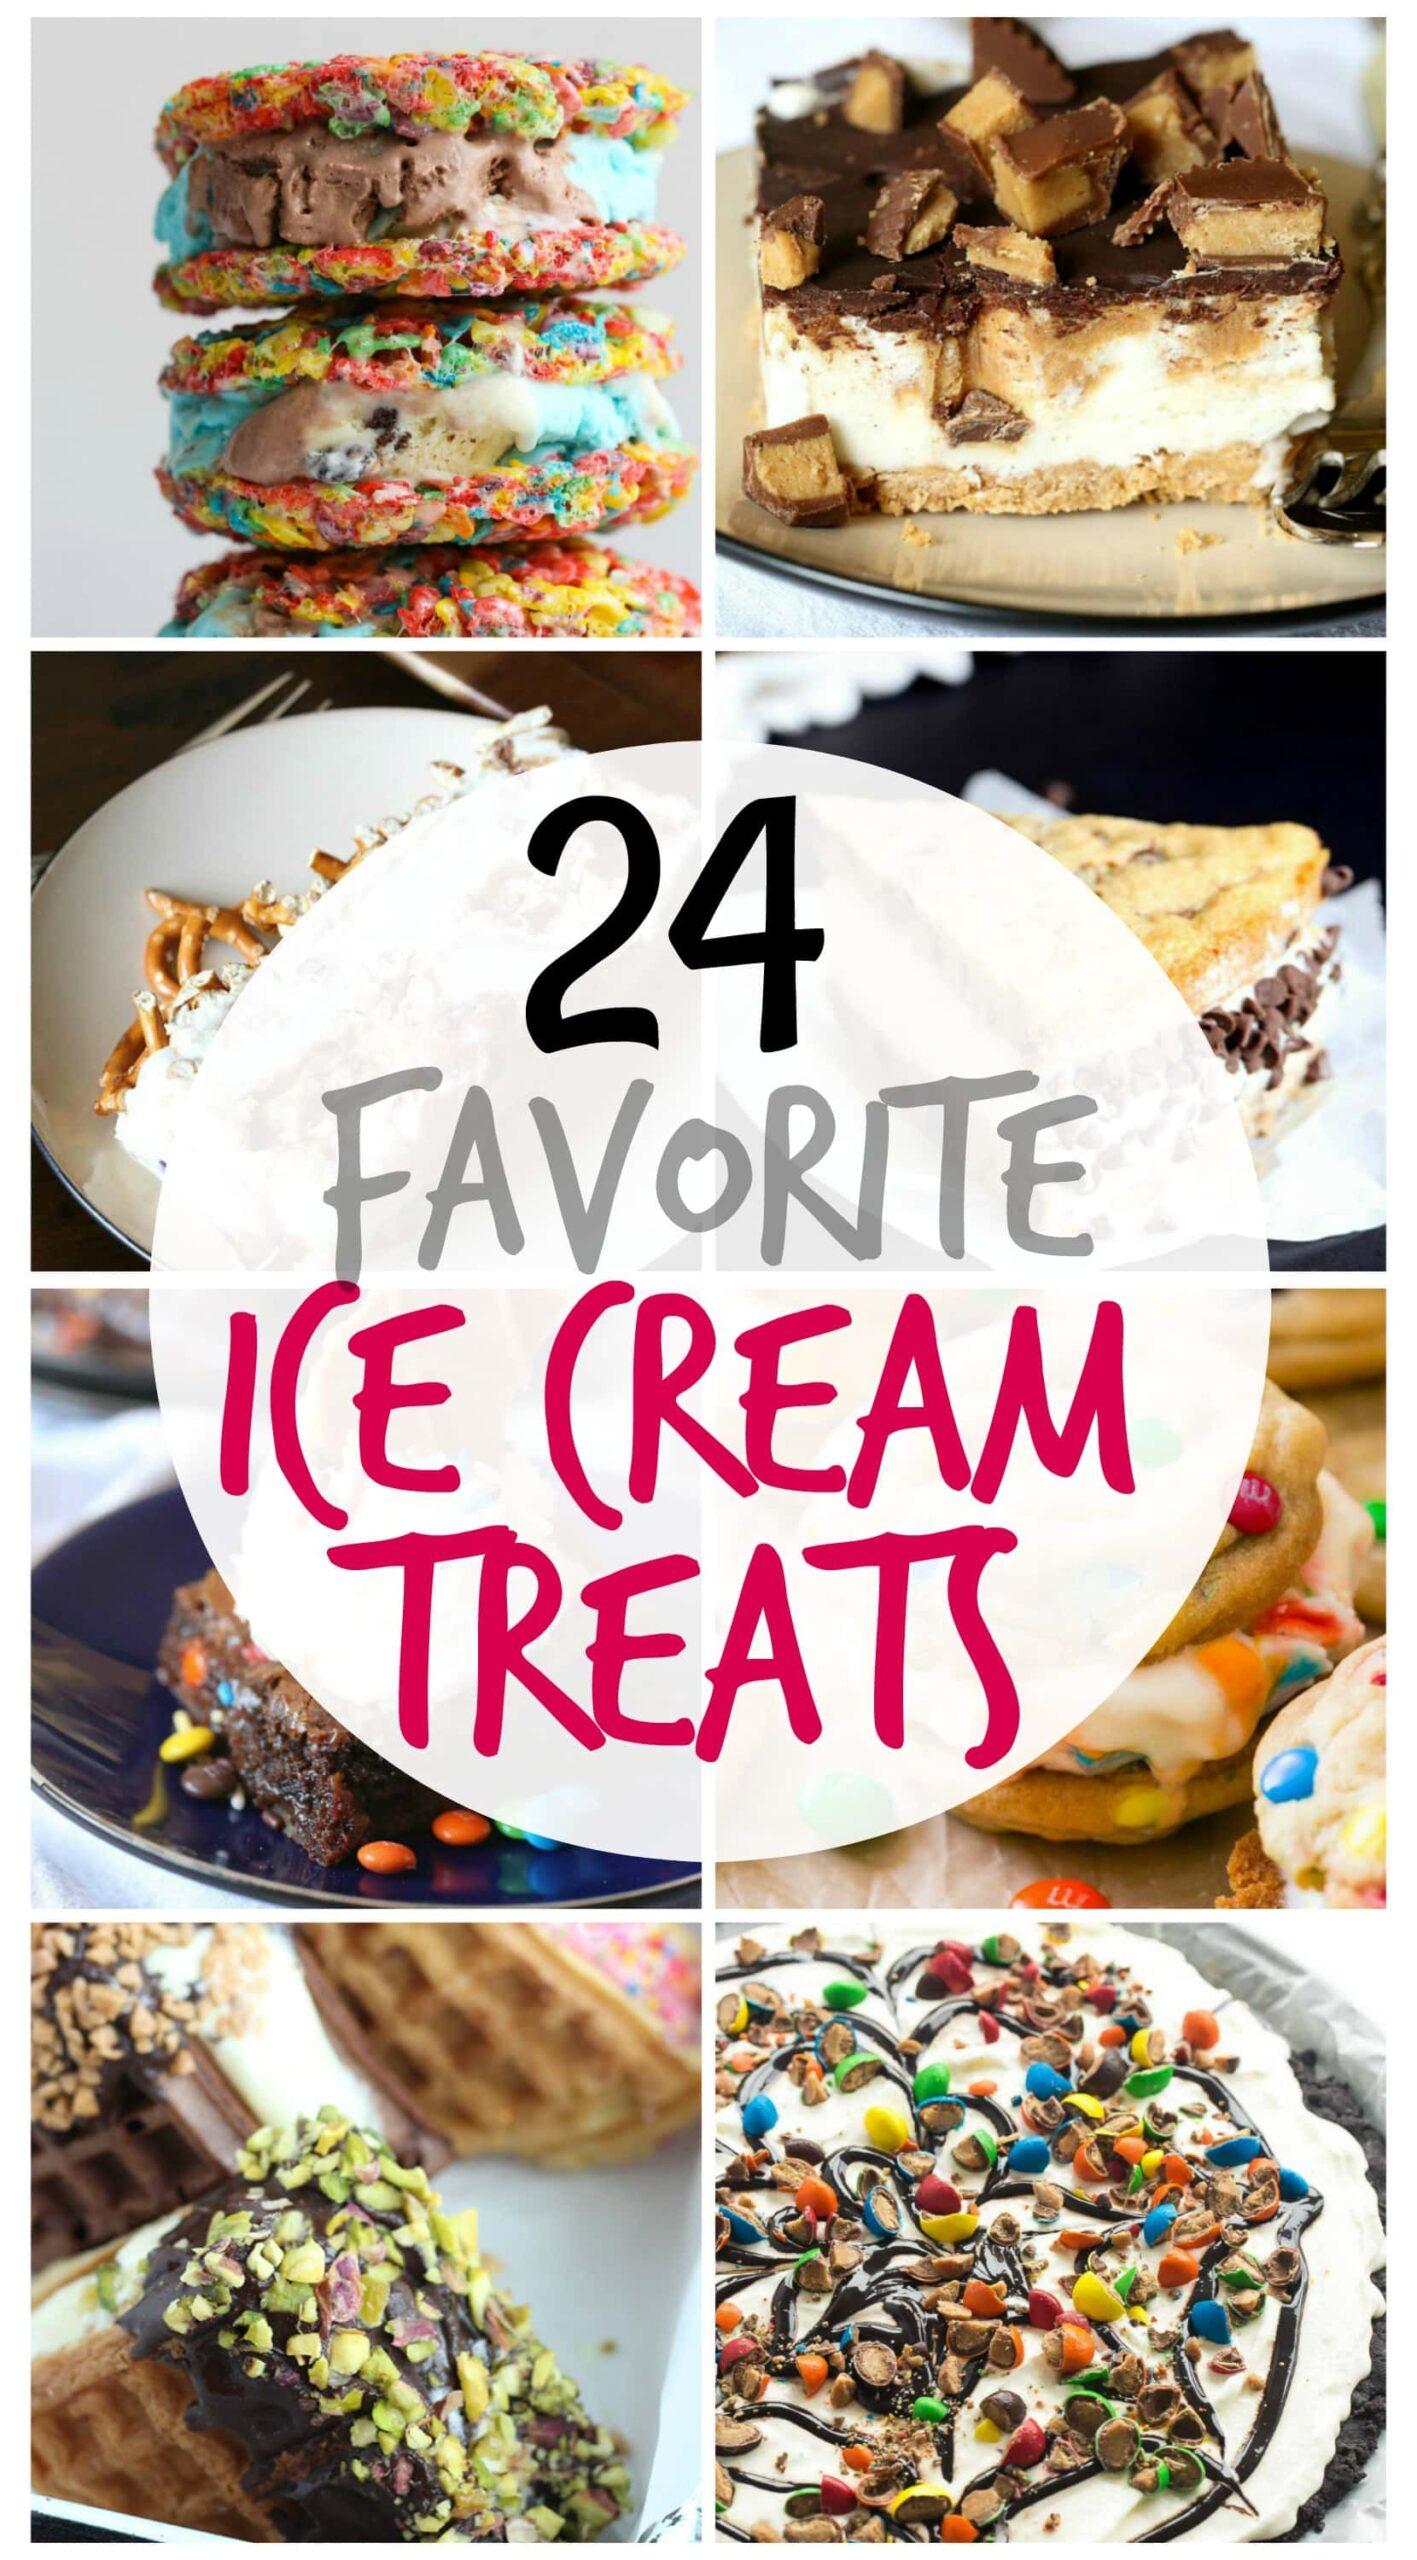 24 Favorite Ice Cream Treats